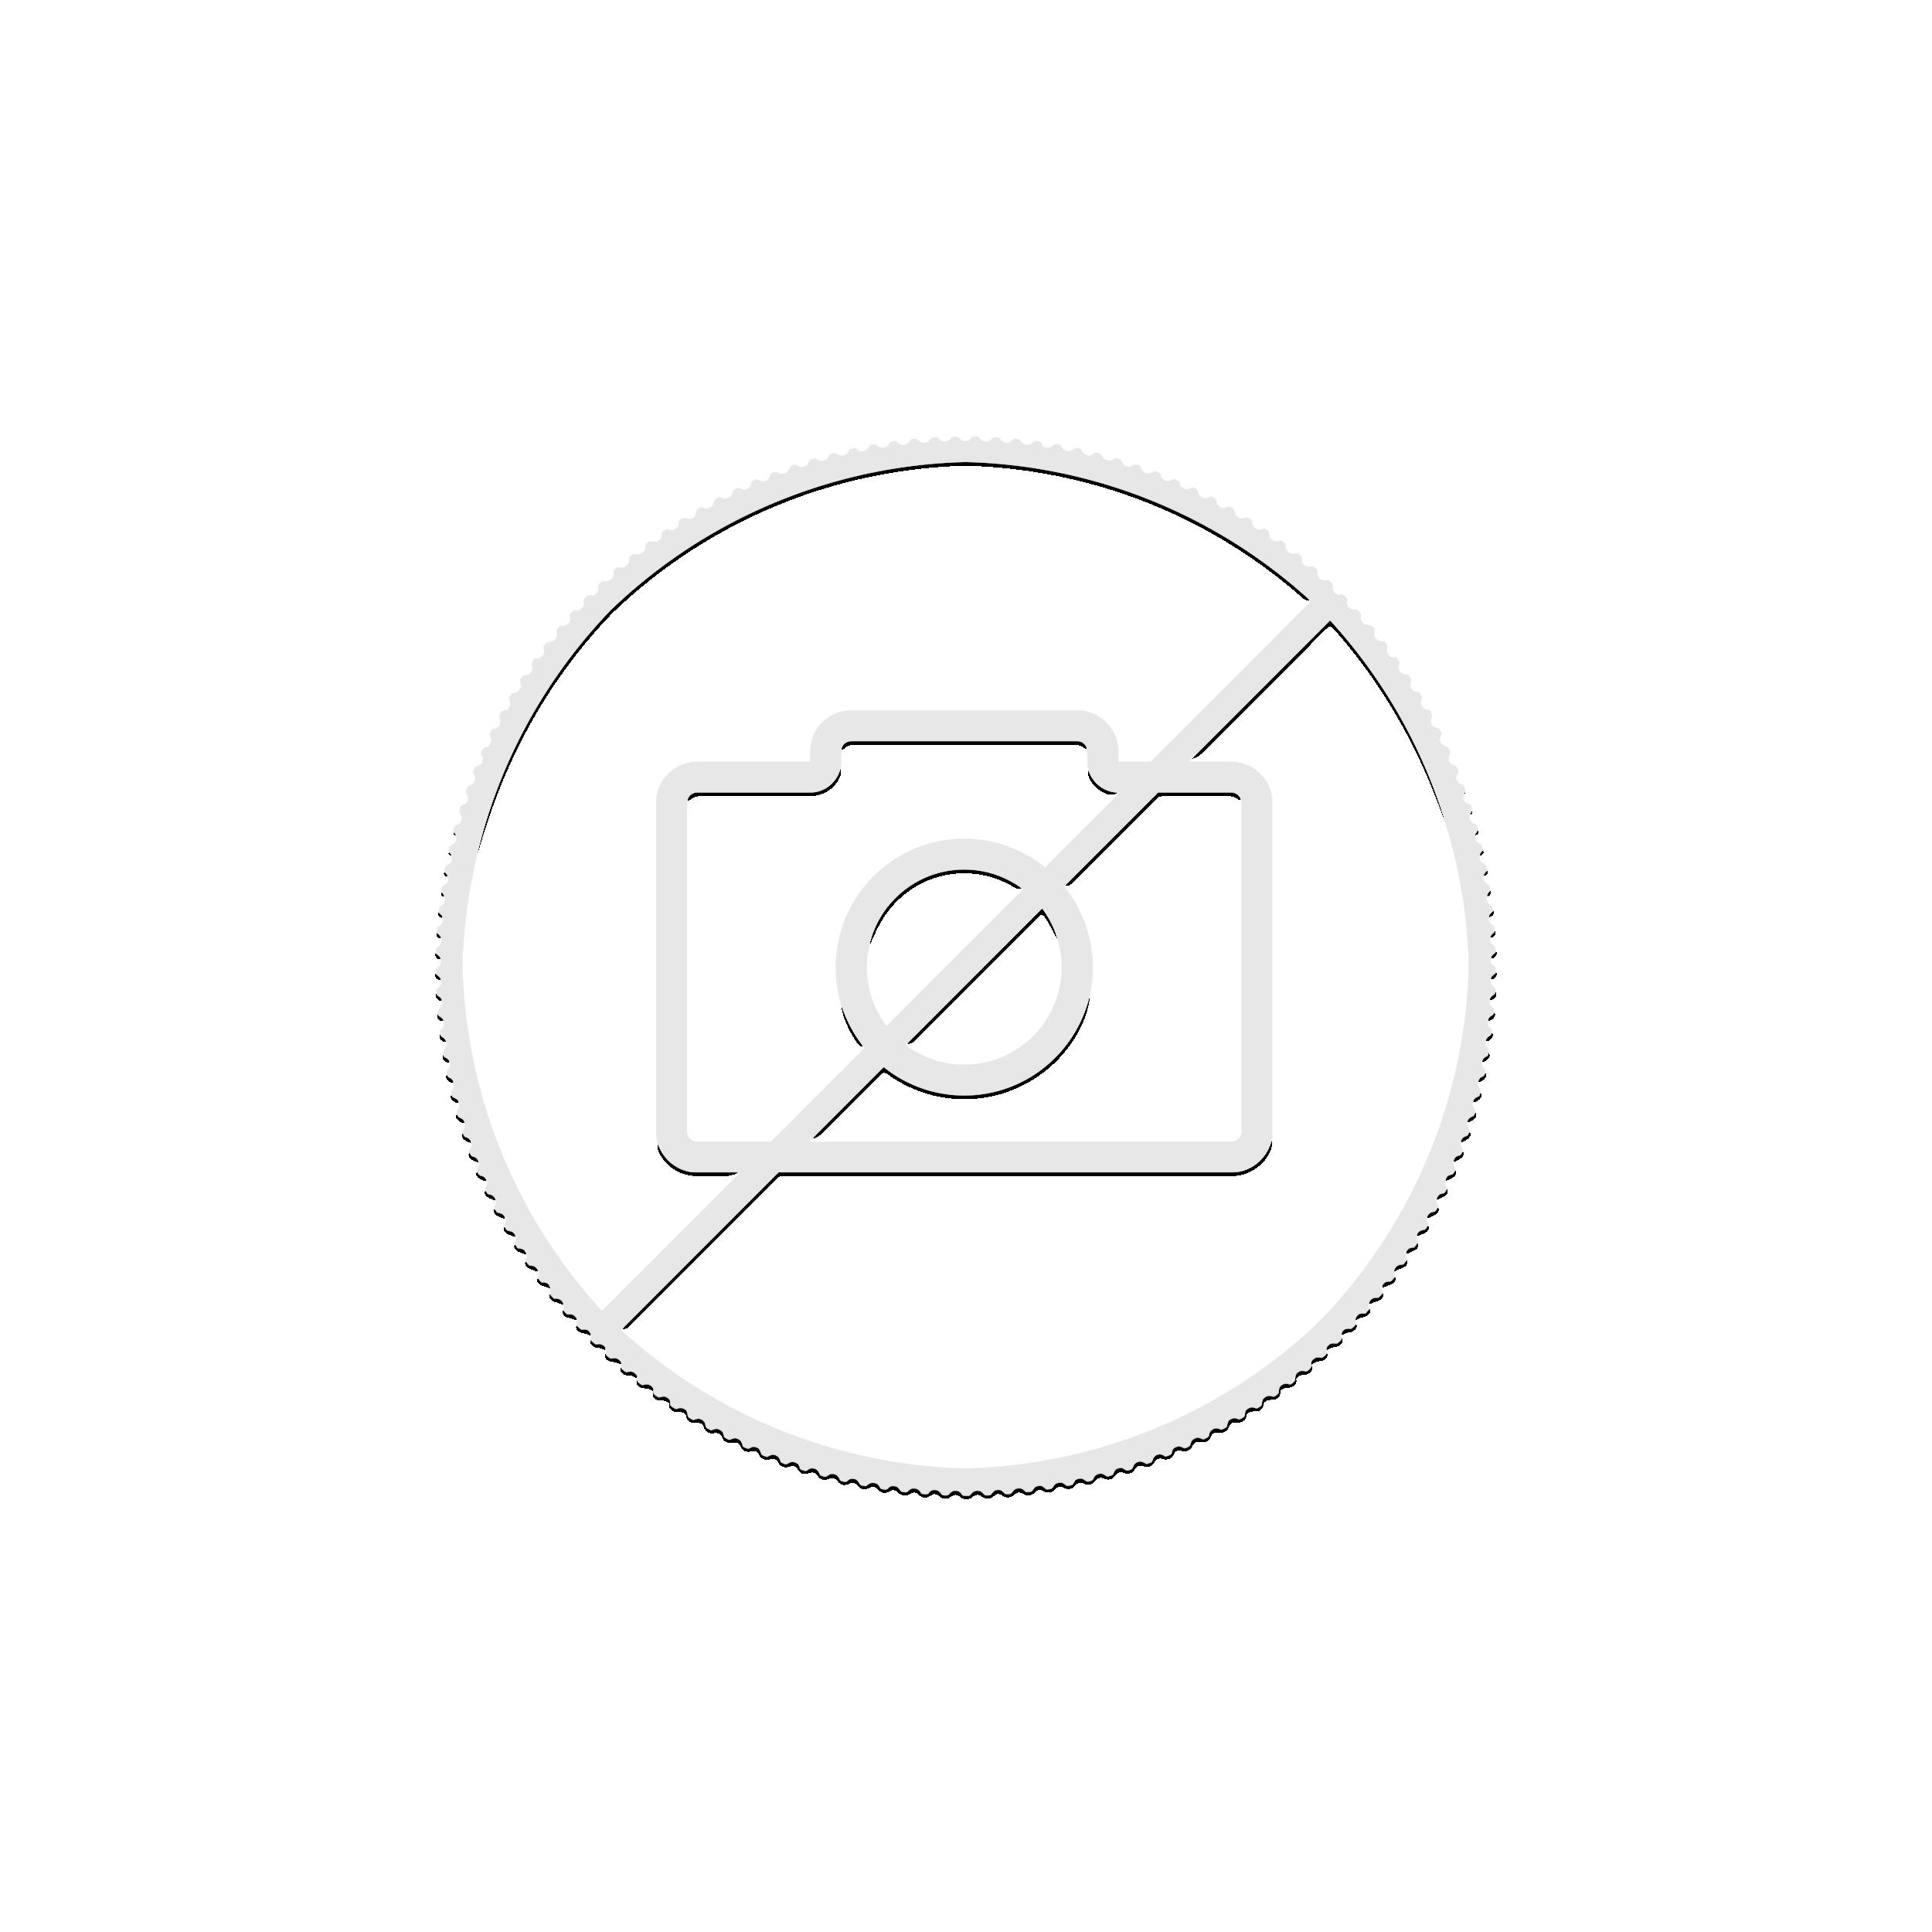 2 troy ounce zilveren munt Titanen Atlas 2020